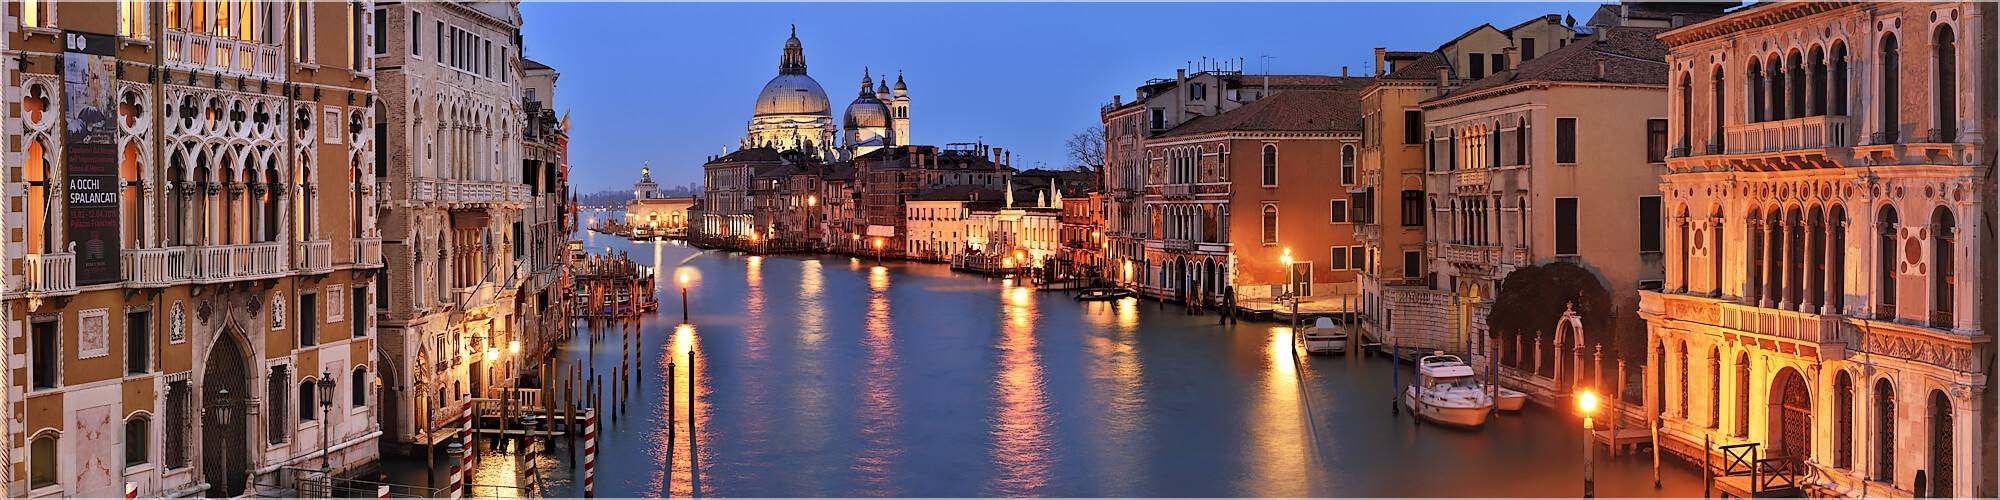 Panoramabild Venedig Italien Santa Maria della Salute